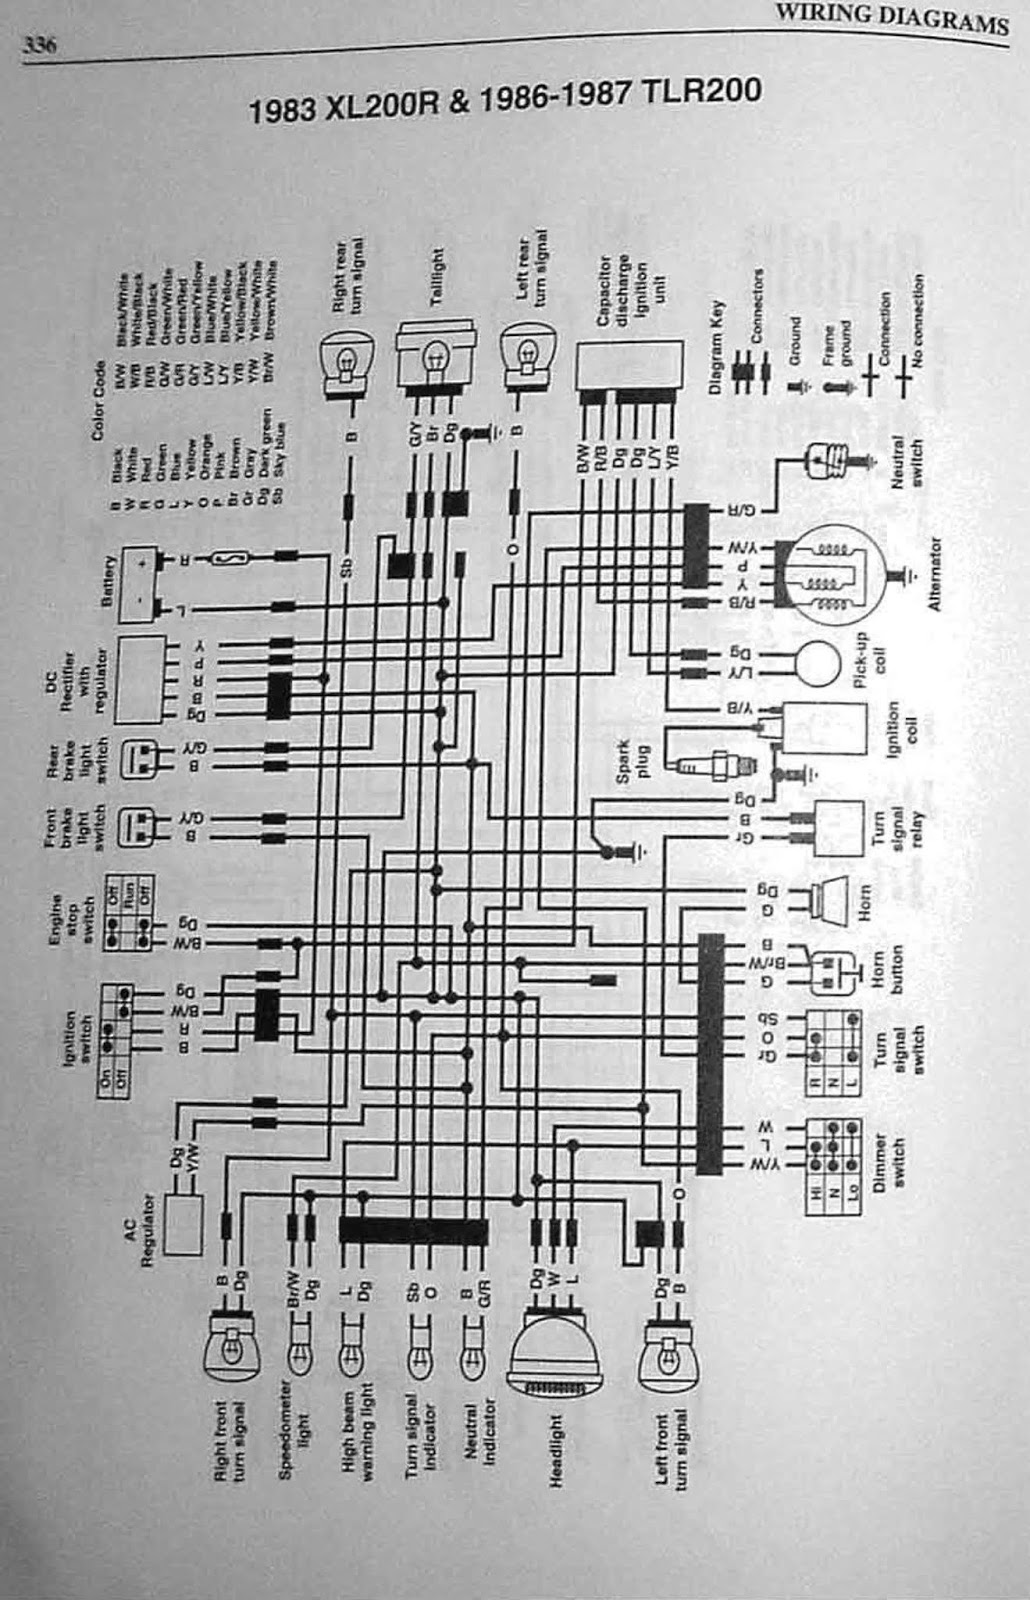 Xl200r Wiring Diagram Experience Of Electric Circuit Bike Dirt Information Jenn S 1984 Rehab Part 1 Electrical Rh Restoringdirtbikes Blogspot Com Honda 1983